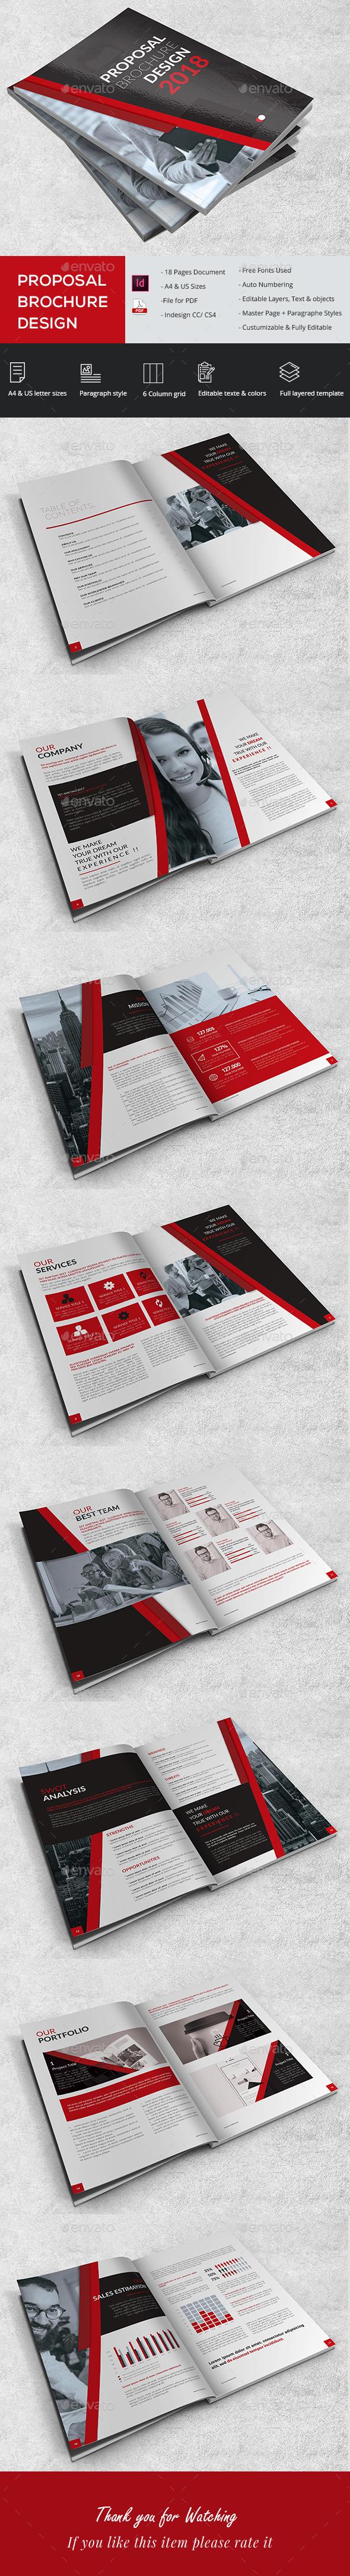 Proposal Brochure Design - Brochures Print Templates